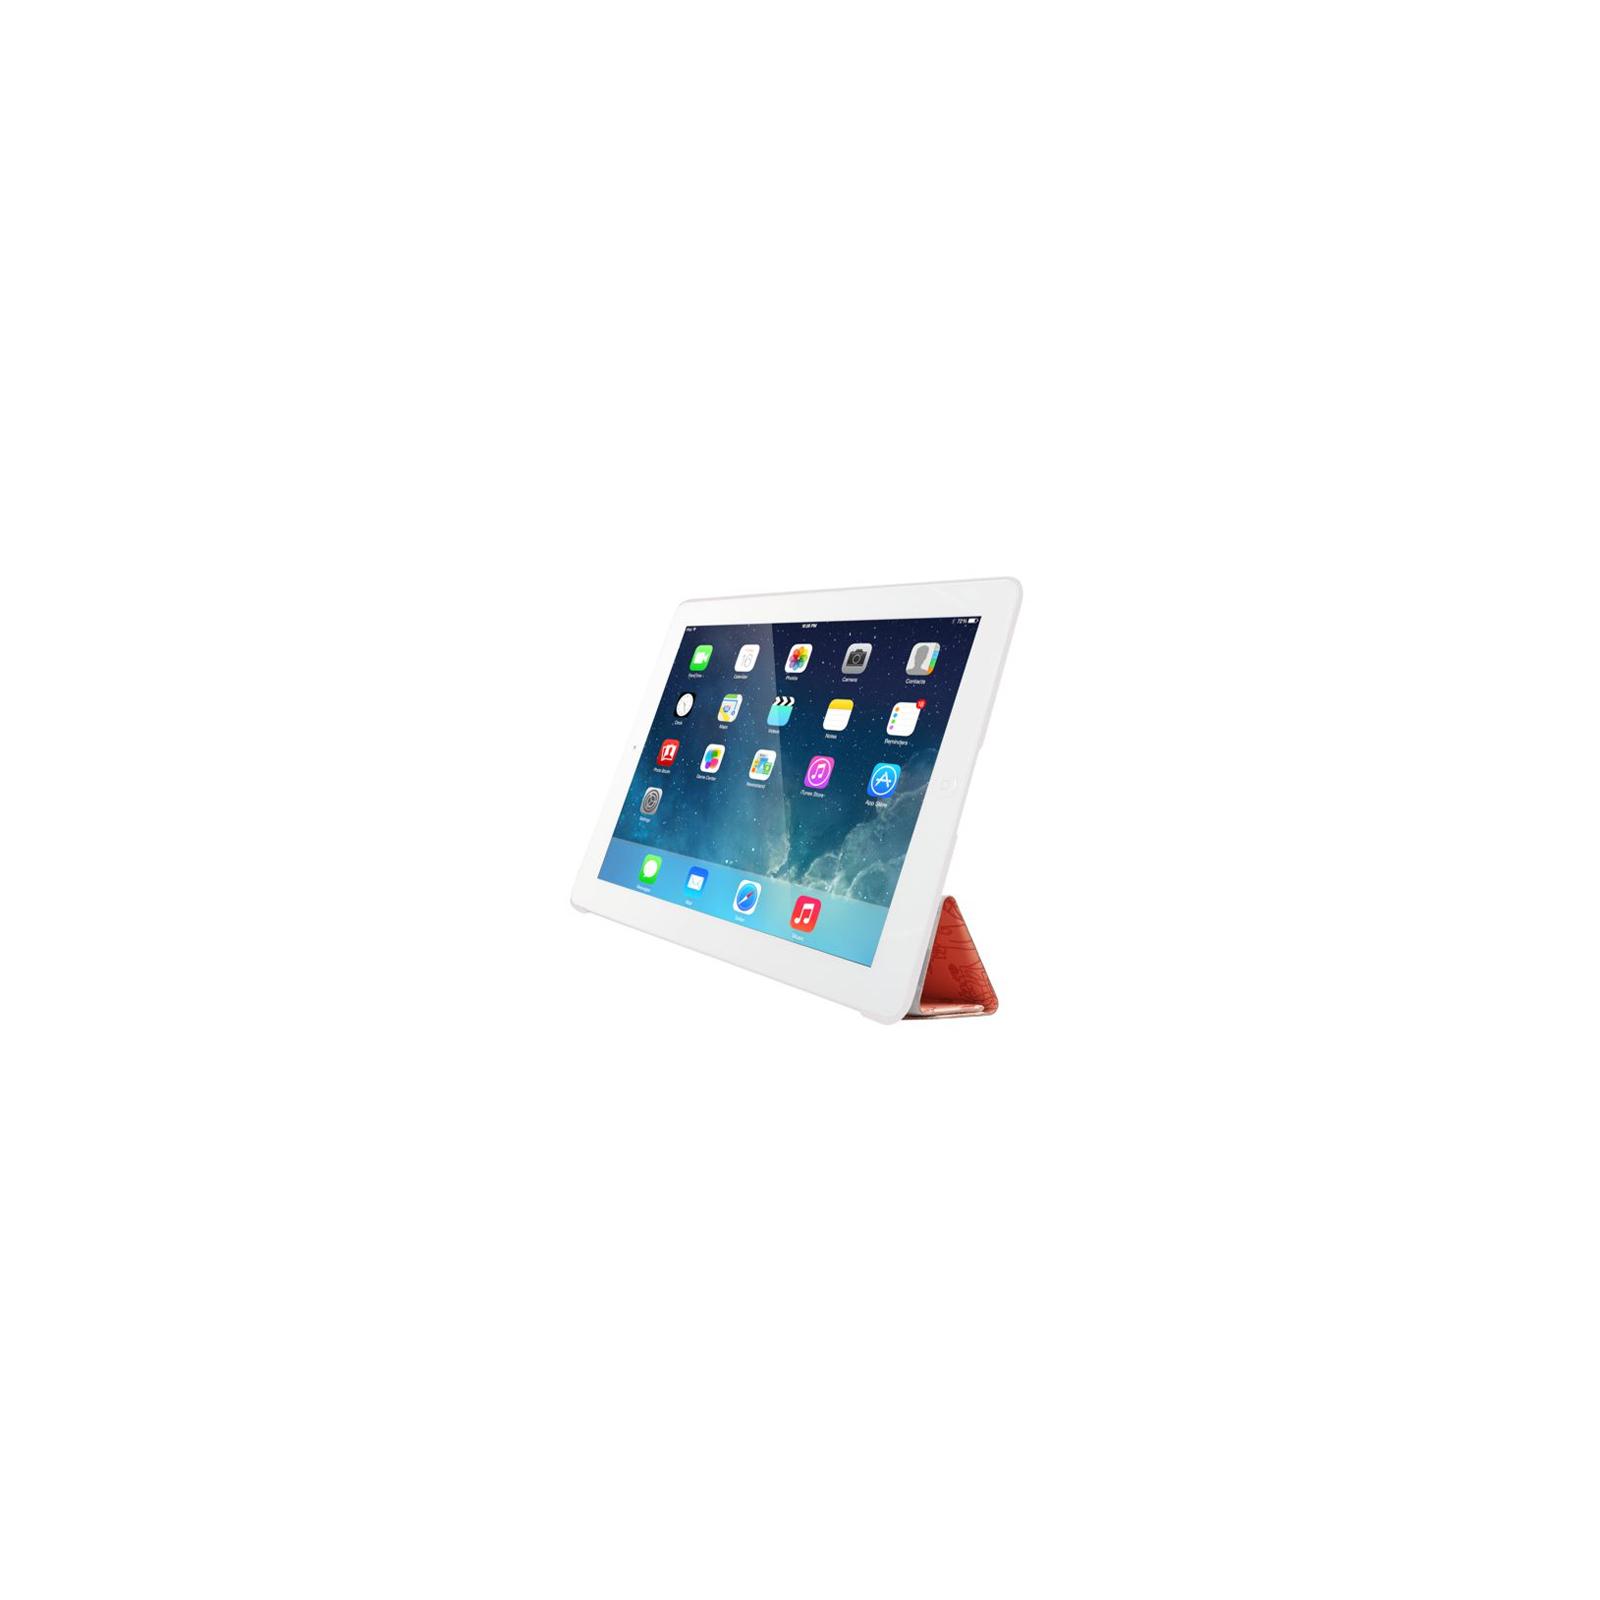 Чехол для планшета OZAKI iPad Air O!coat Travel 360° Multiangle (OC111PR) изображение 2